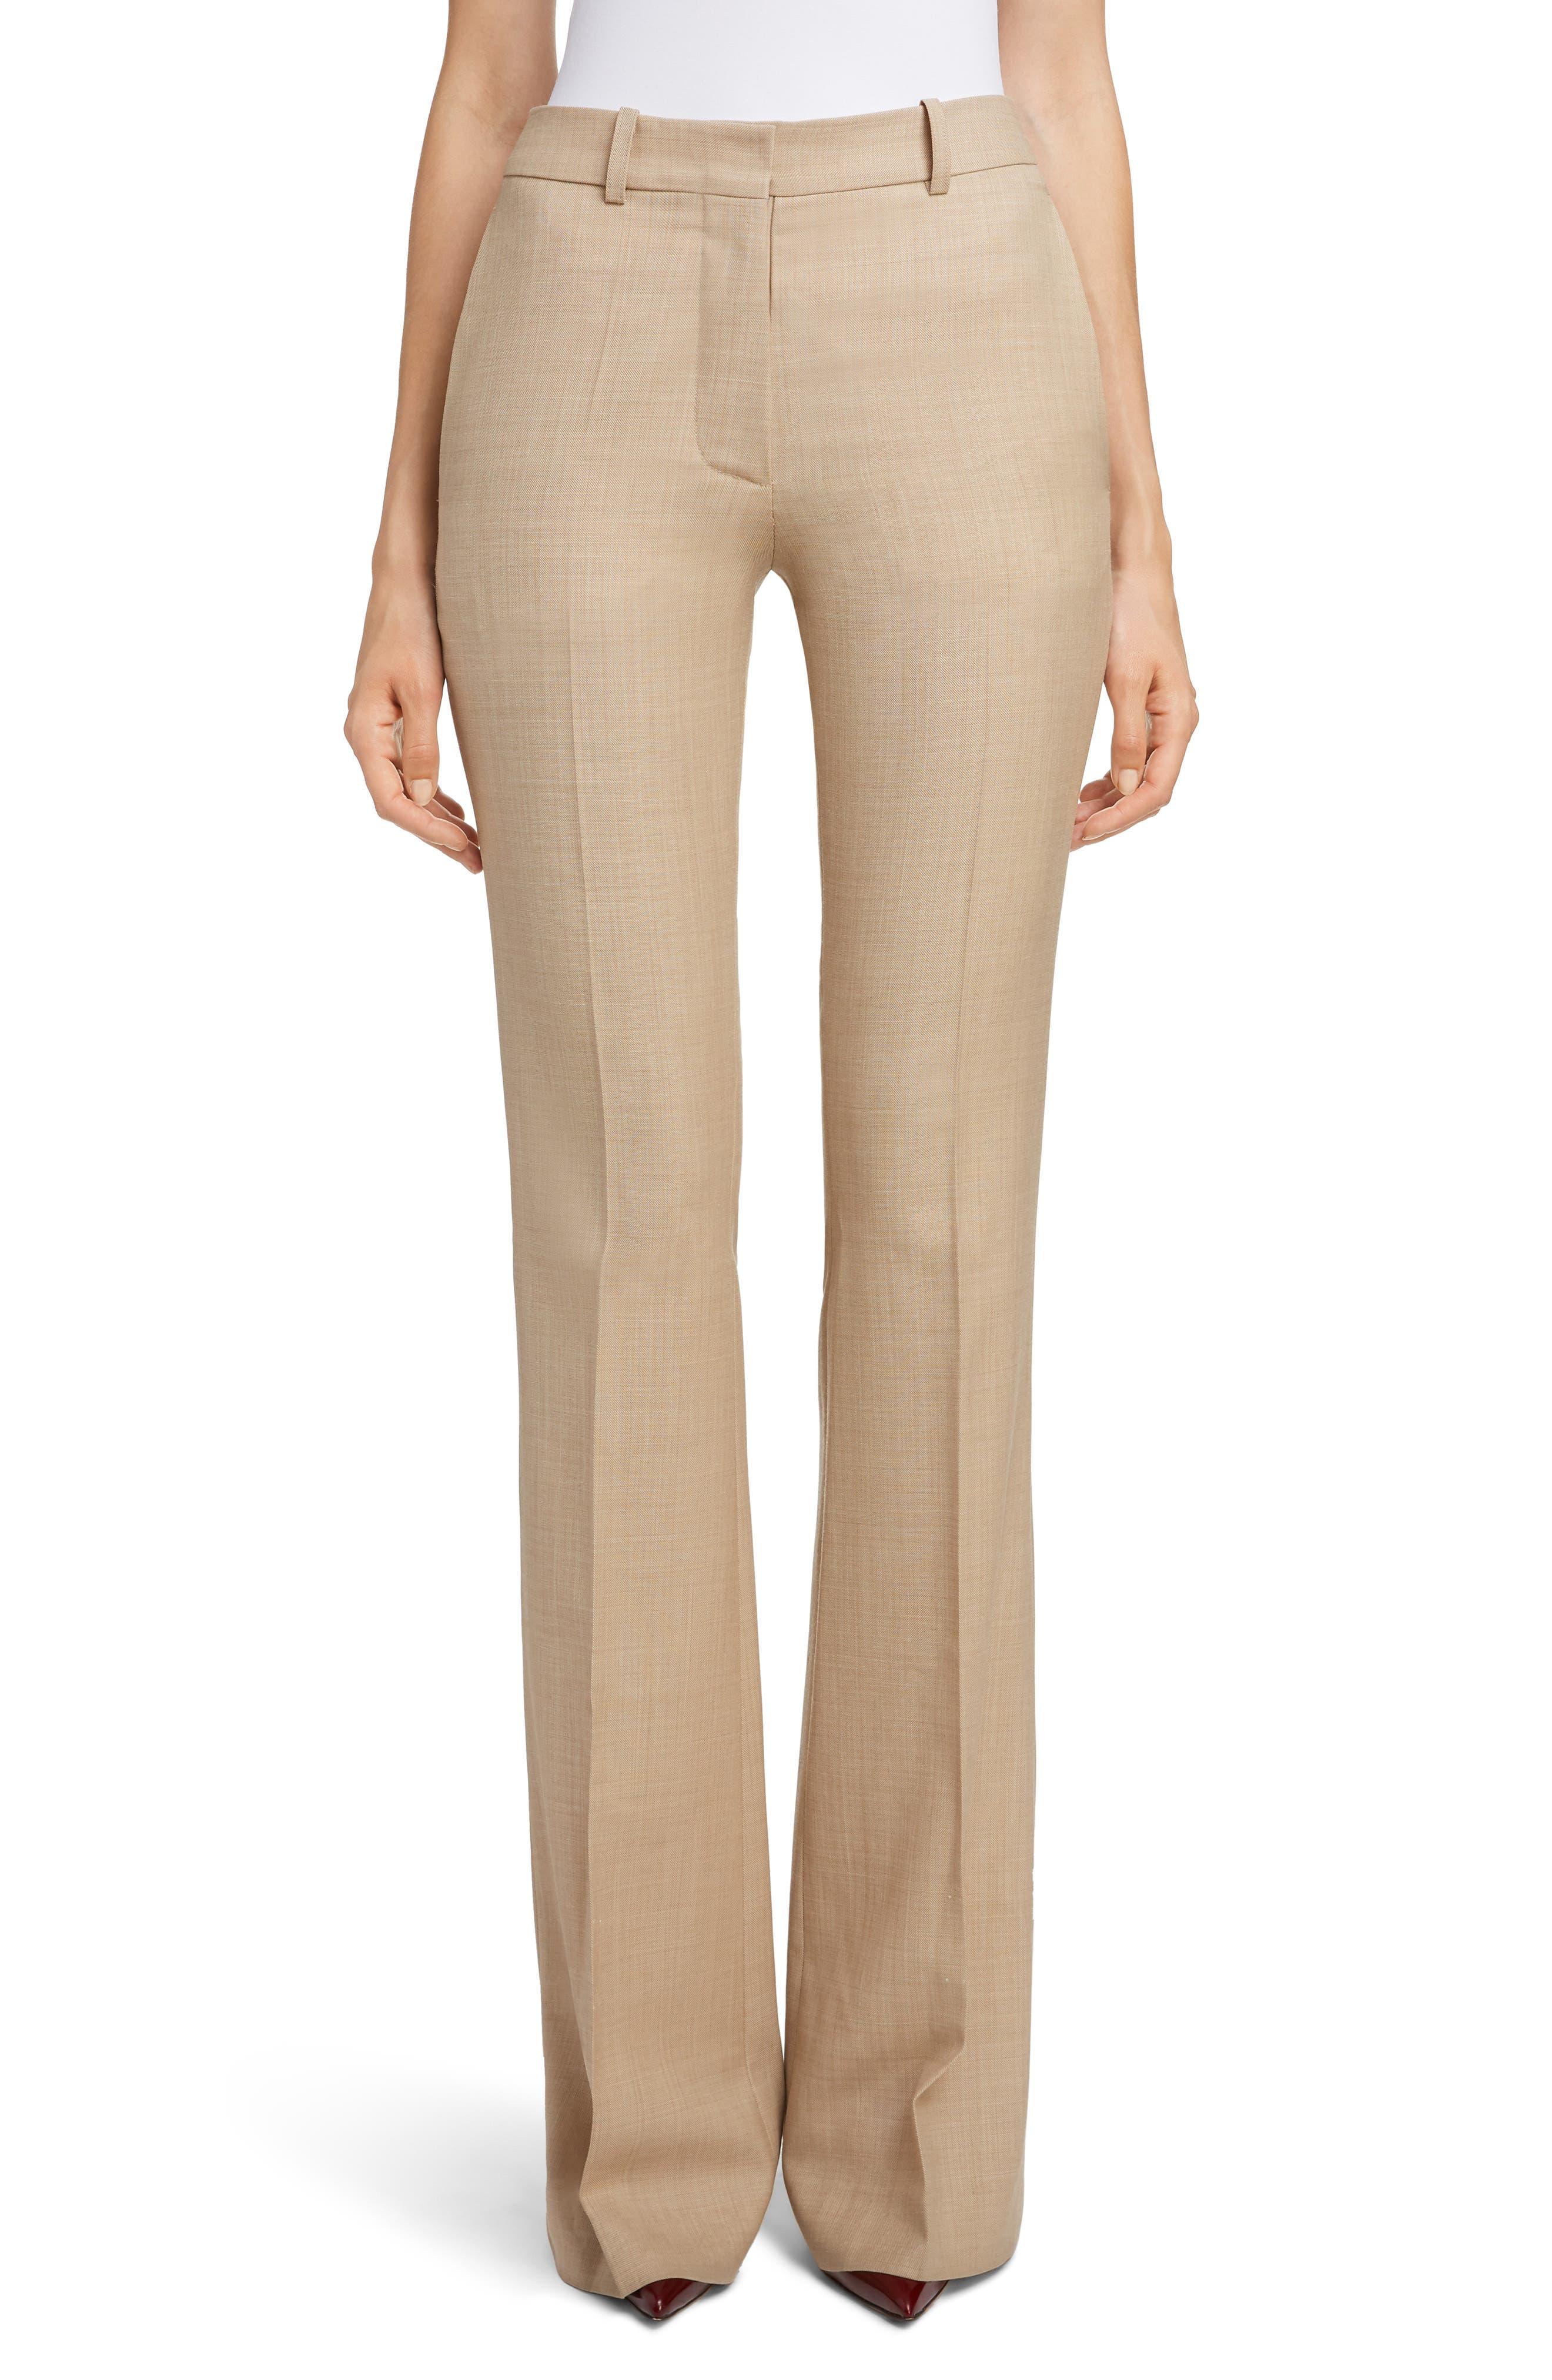 VICTORIA BECKHAM, High Waist Flare Wool Pants, Main thumbnail 1, color, LIGHT BEIGE-WHITE